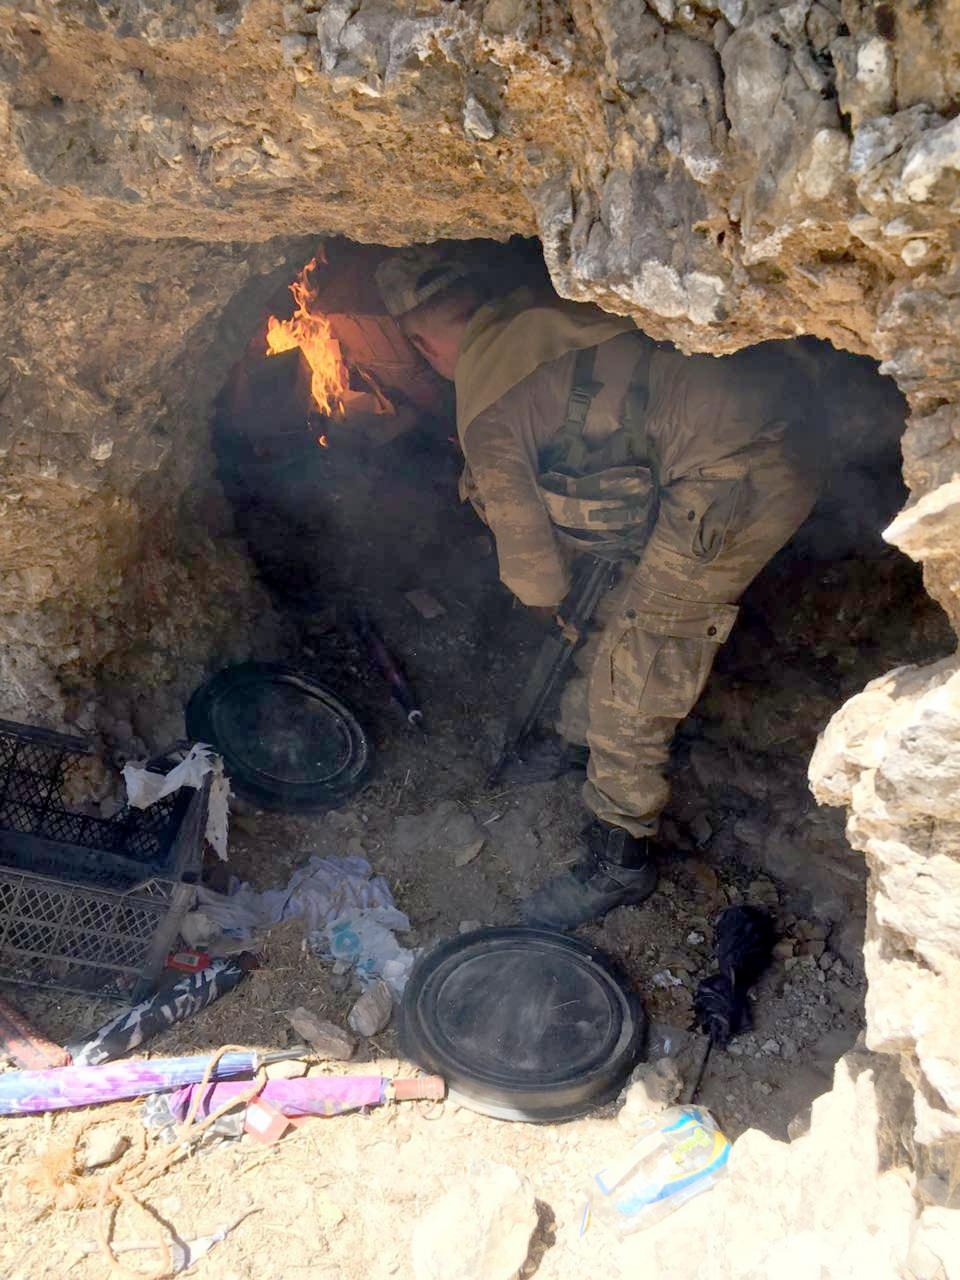 Cudi Dağı'nda 3 terörist öldürüldü 25